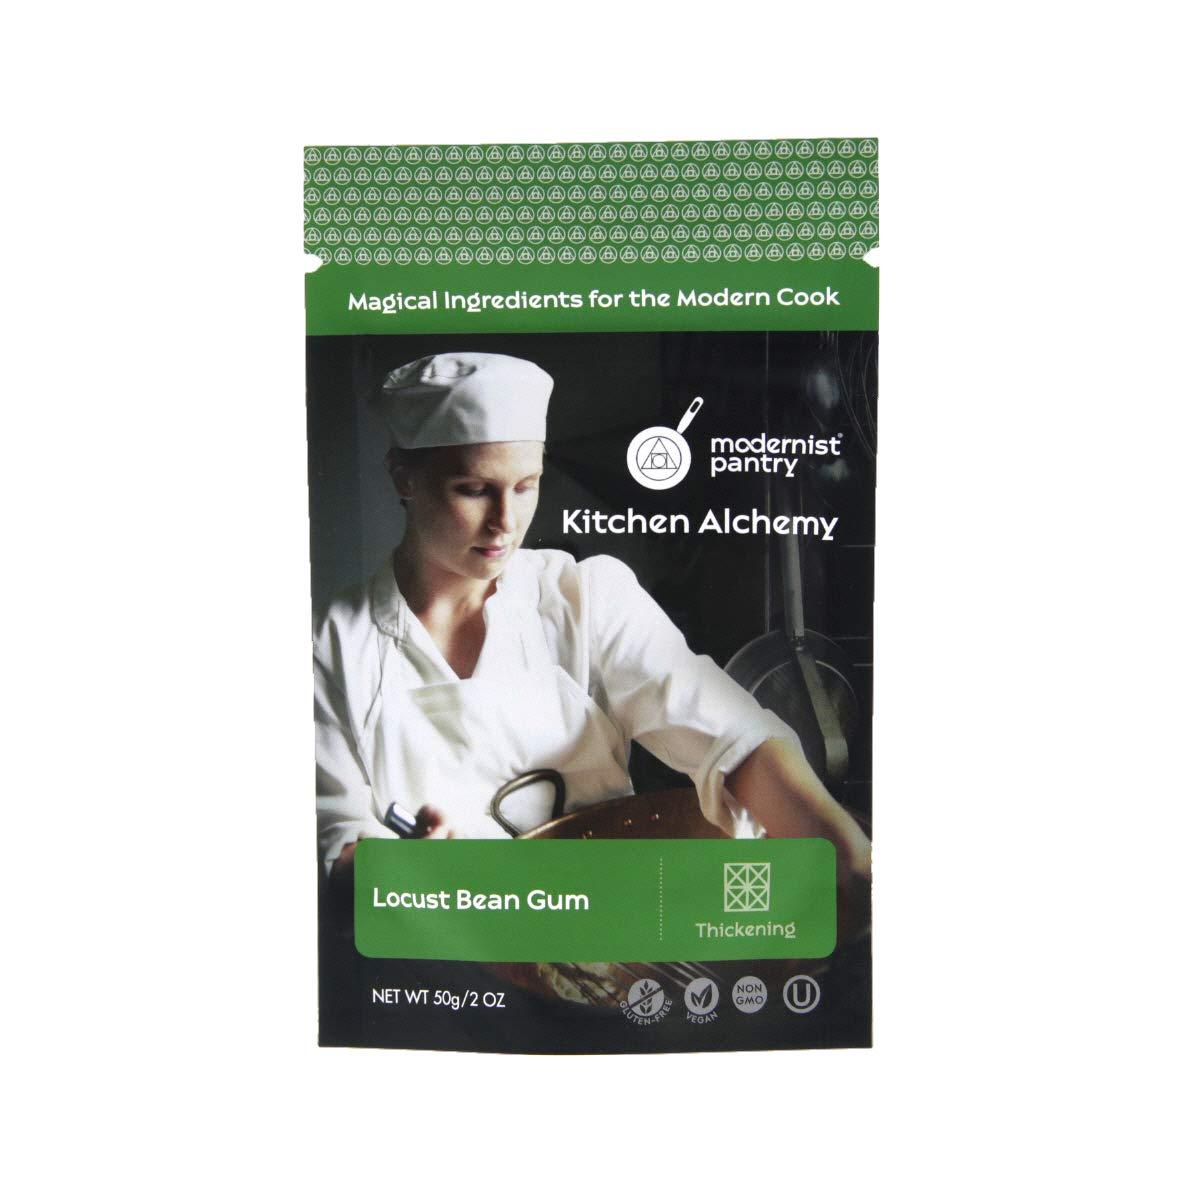 Food Grade Locust Bean Gum (Molecular Gastronomy) ⊘ Non-GMO ☮ Vegan ✡ OU Kosher Certified - 50g/2oz